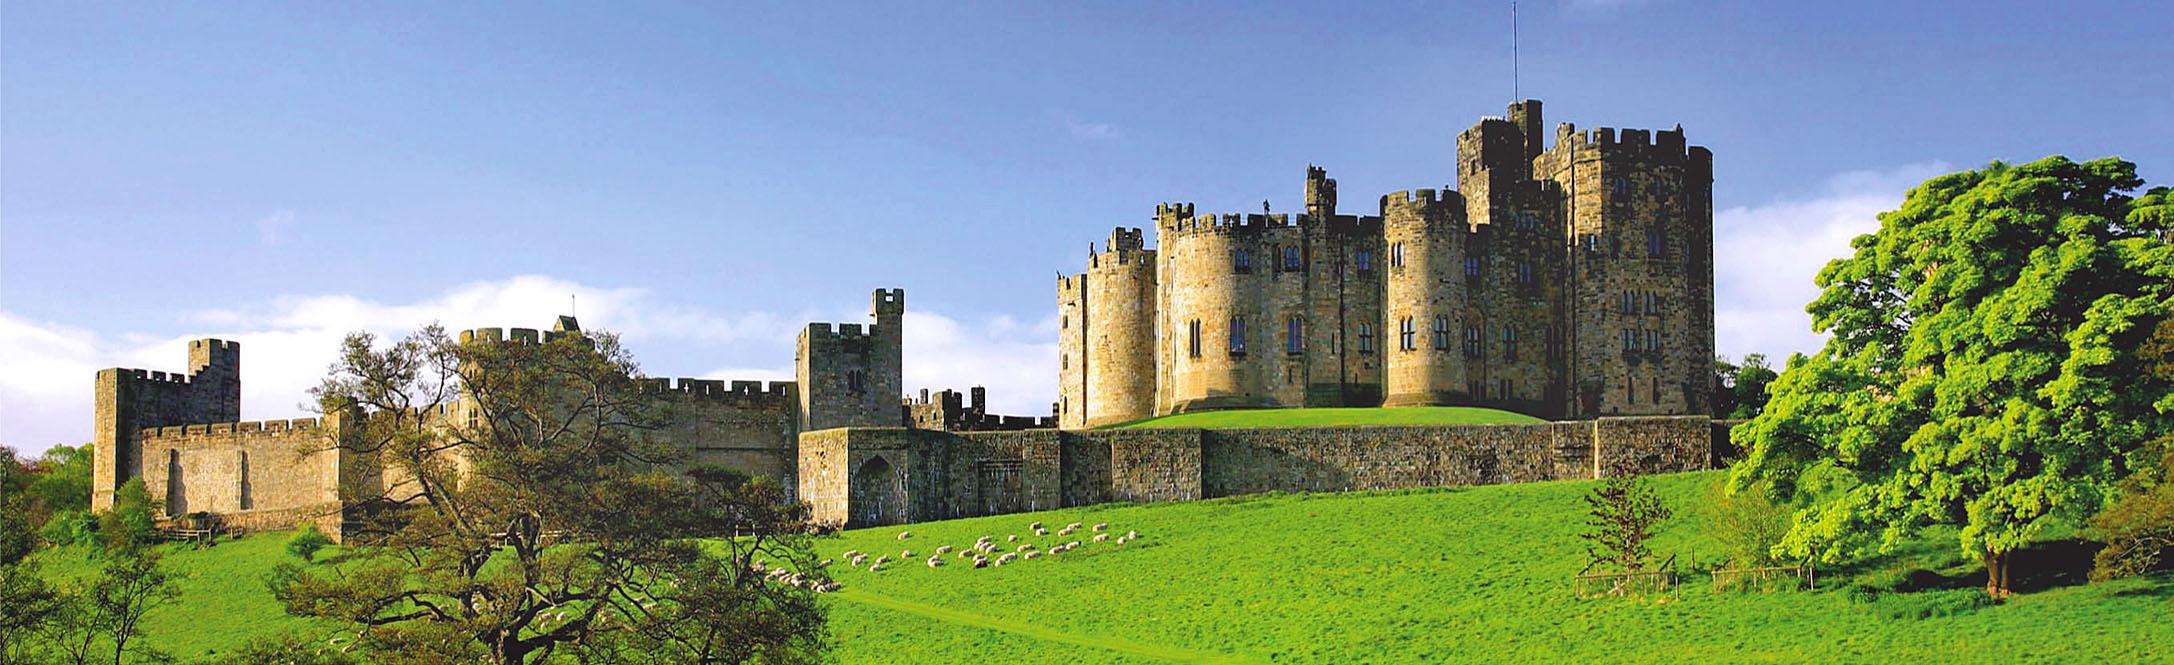 Alnwick Castle, Northumberland.jpg